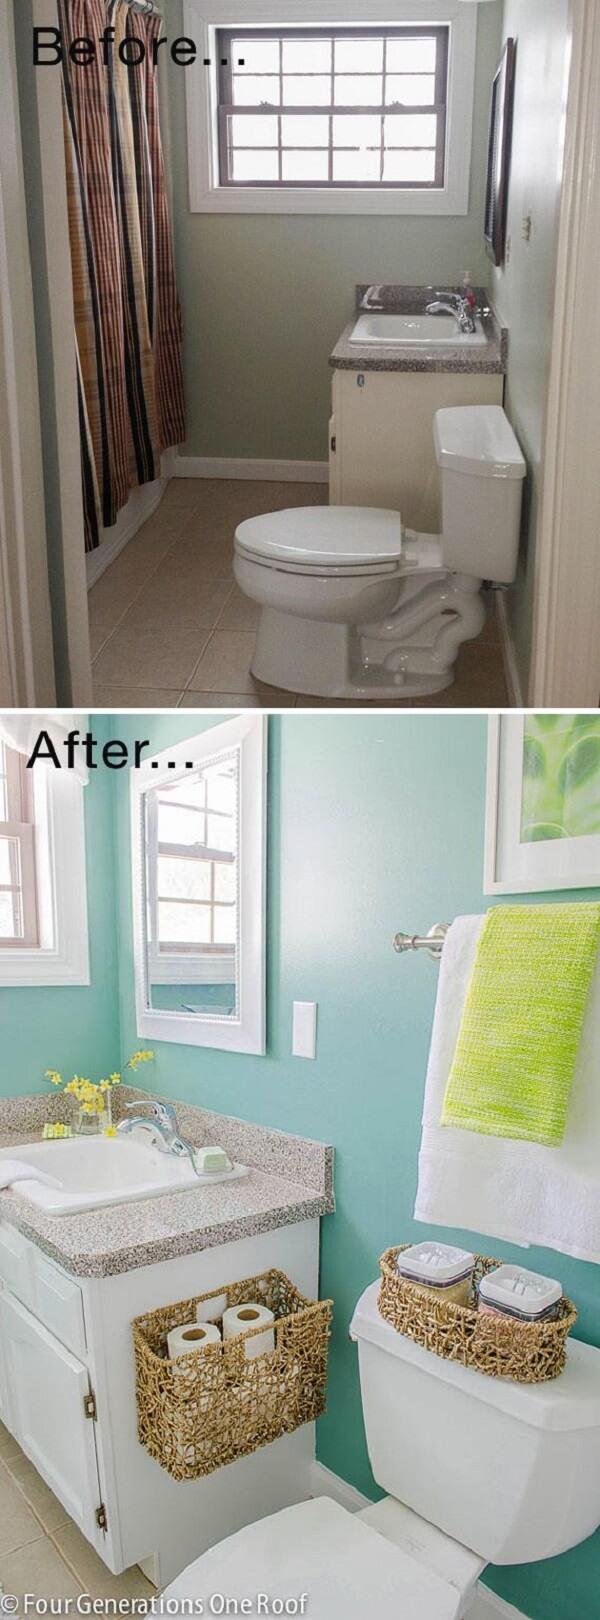 28 Best Budget Friendly Bathroom Makeover Ideas and ... on Small Space Small Bathroom Ideas On A Budget id=64374